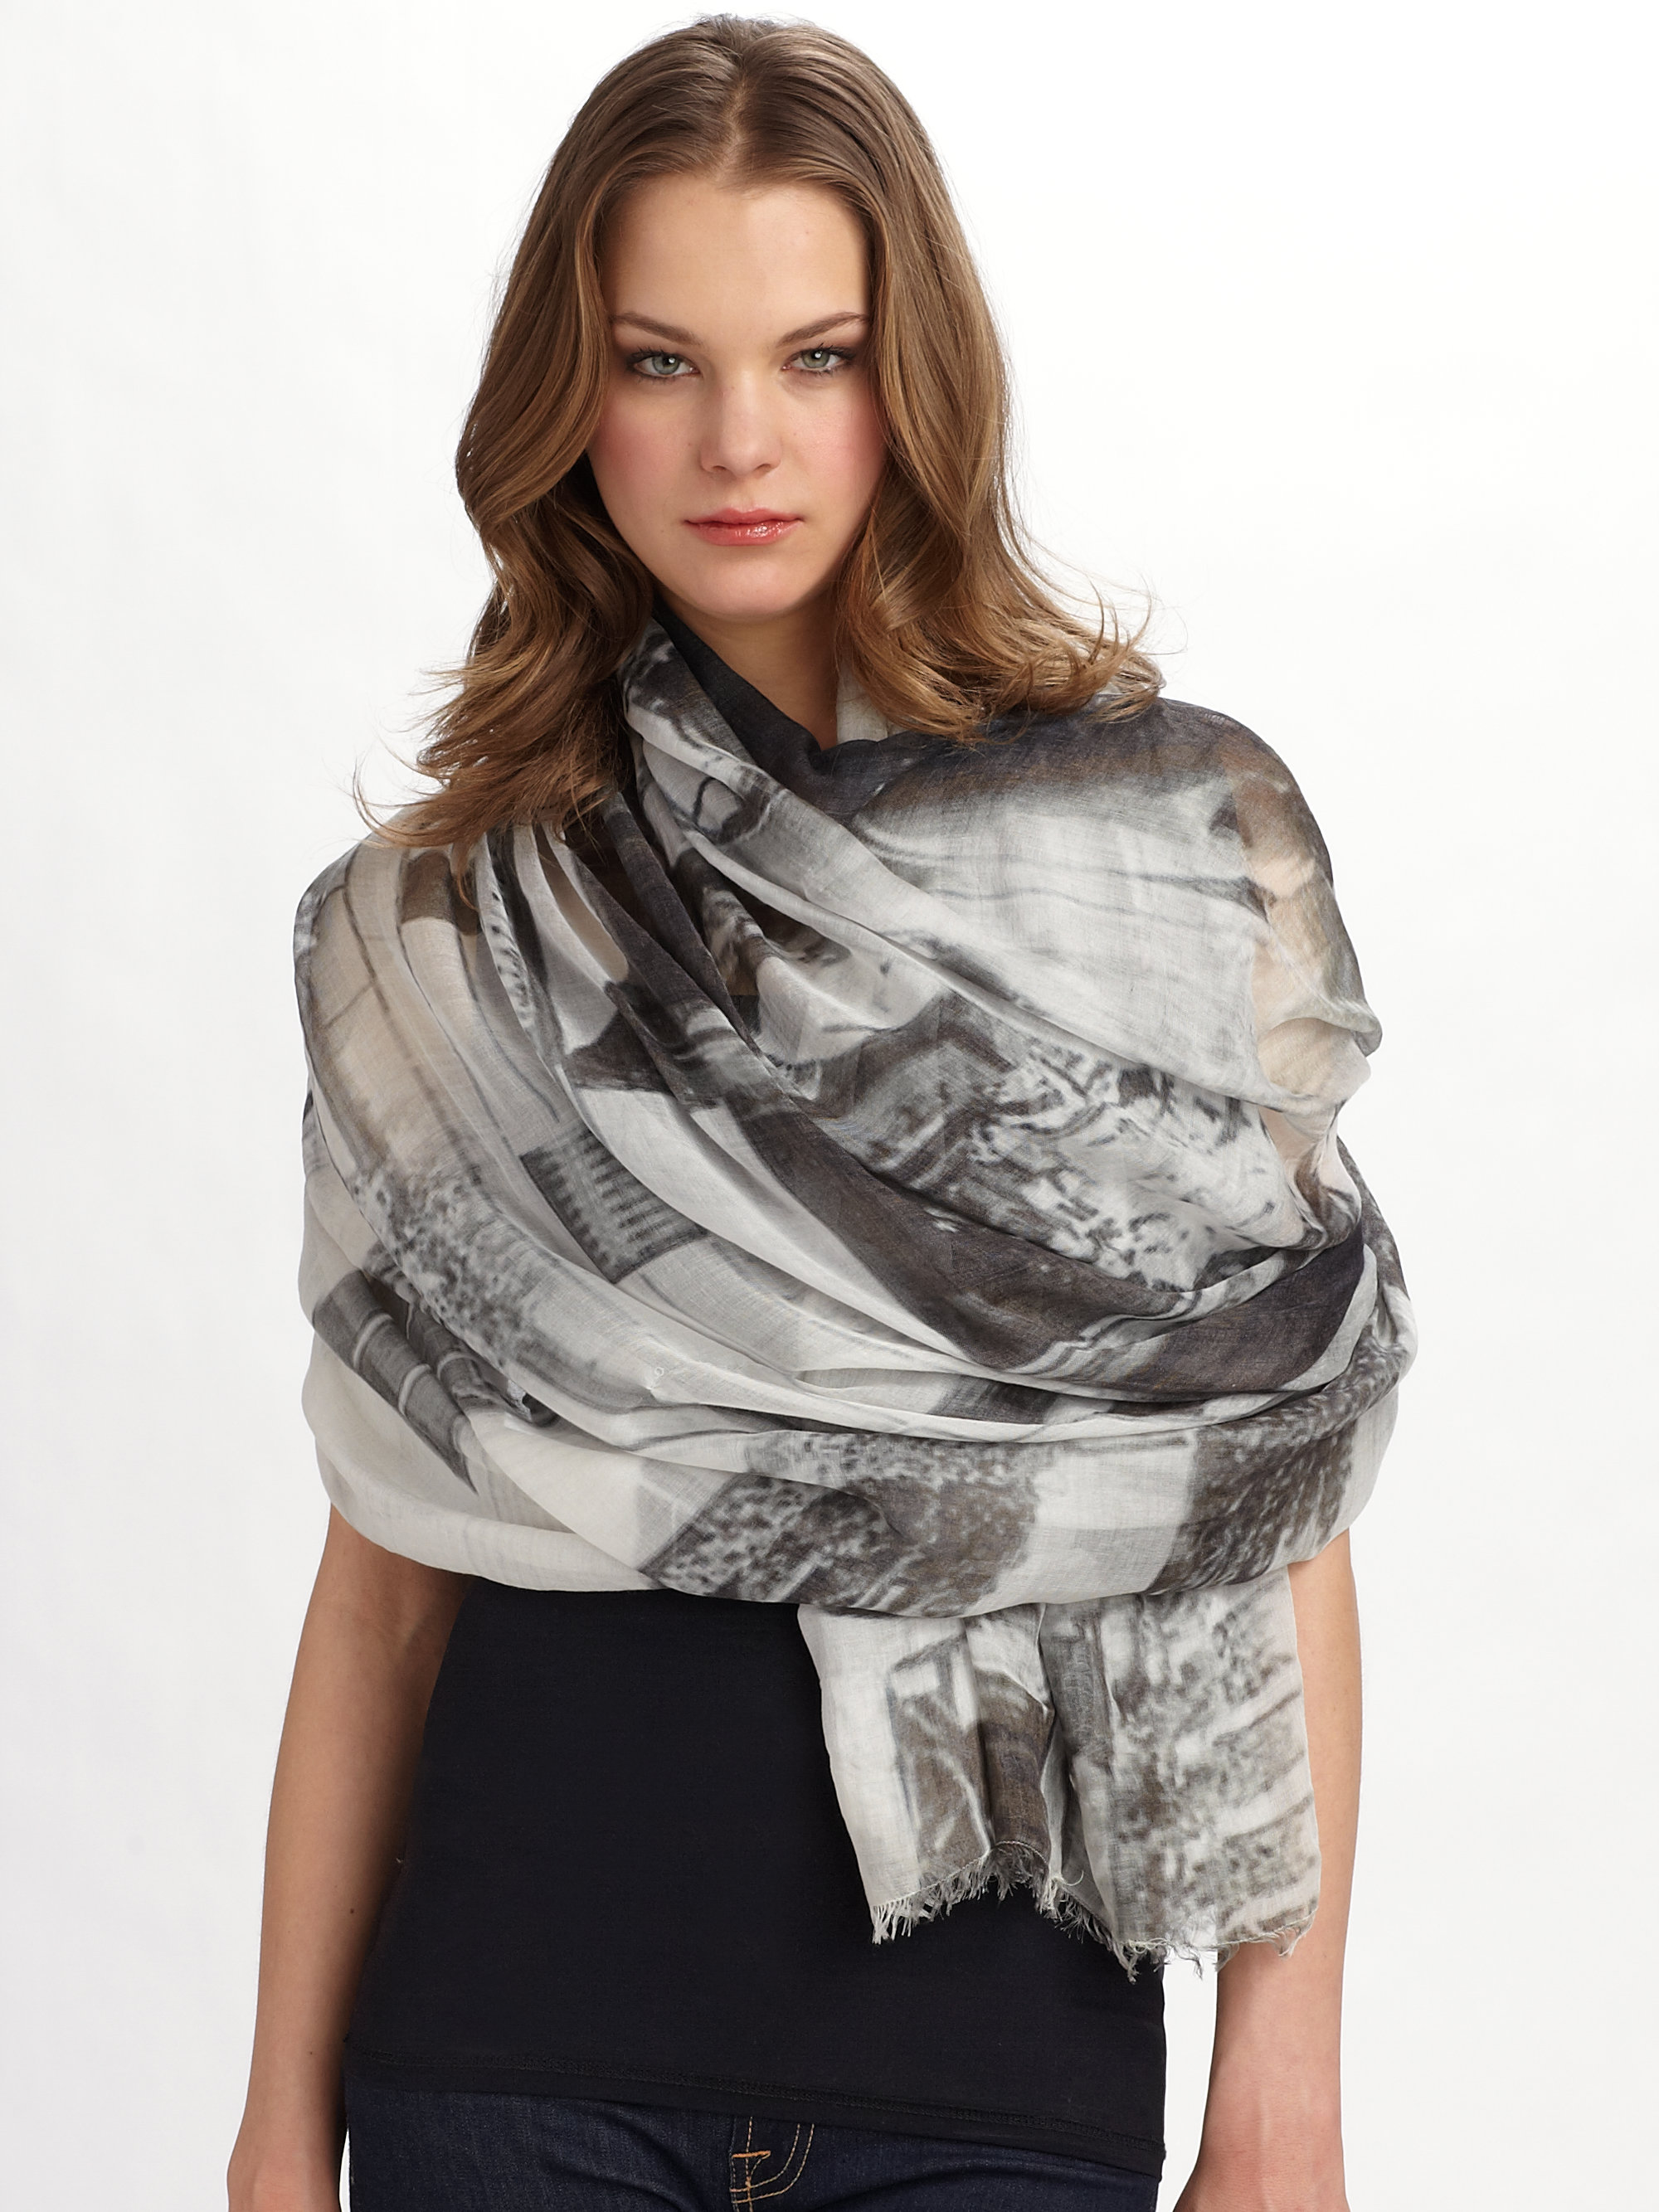 fullscreen multi lyst view floral colour scarf accessories print cashmere camouflage wash ferrari wool evans franco